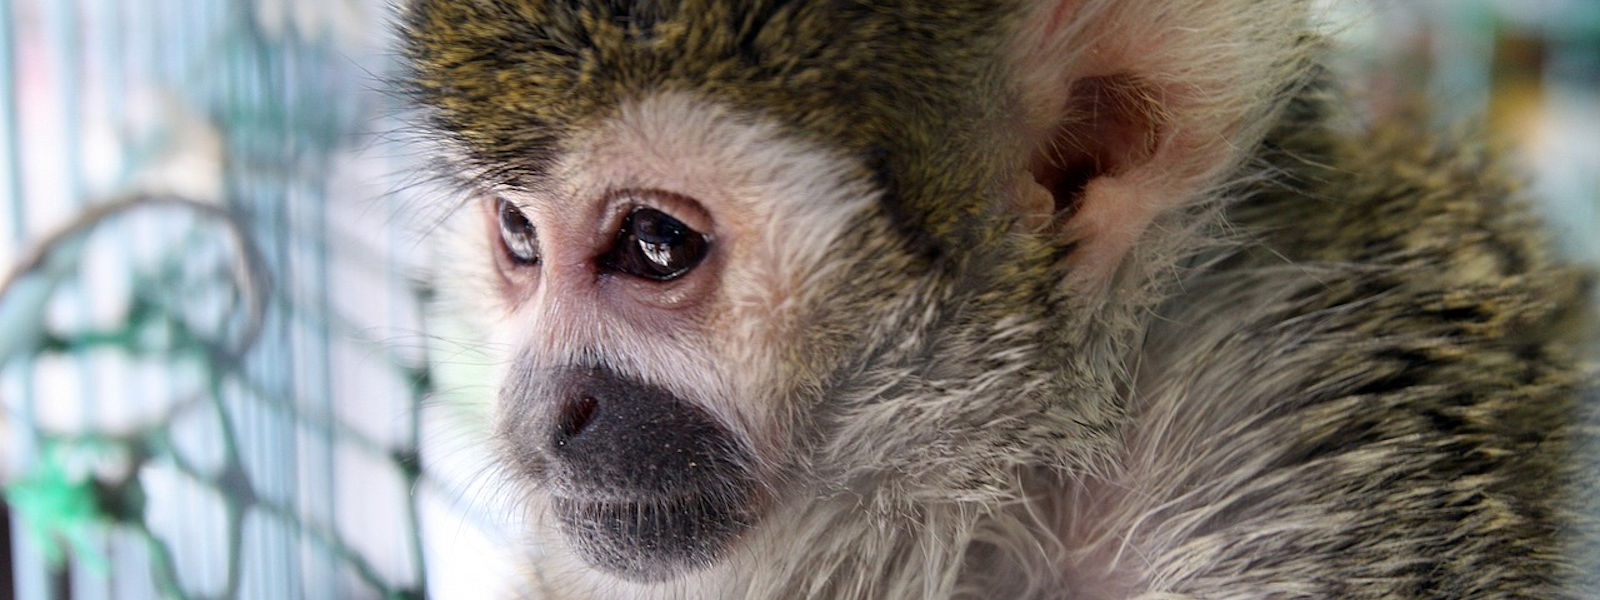 Nos amis les singes: grooming, schmoozing, etc.